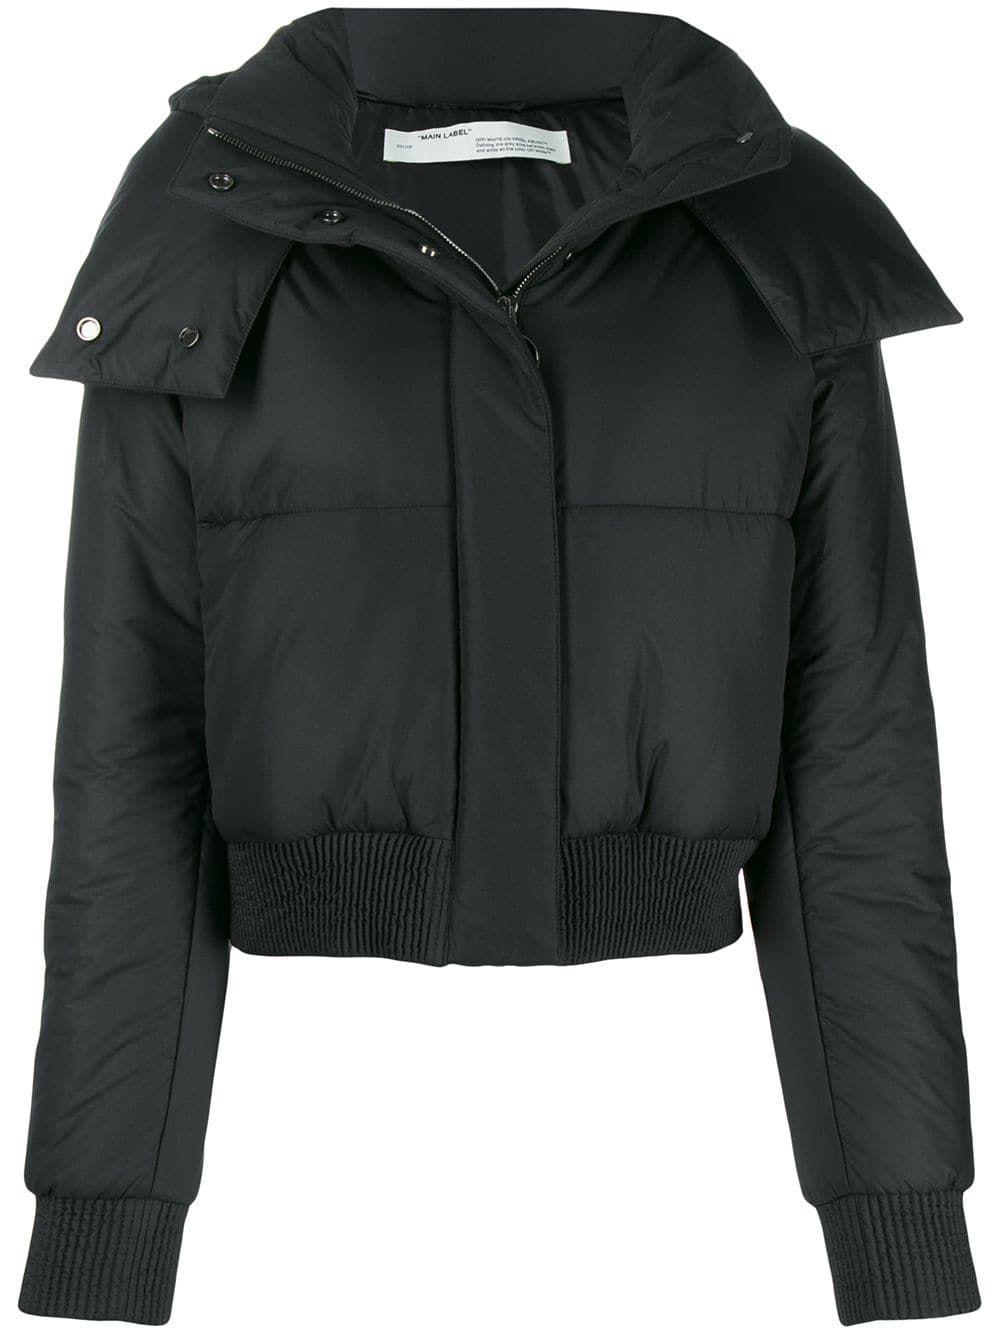 Off White Padded Logo Puffer Jacket Farfetch Black Bomber Jacket Off White Jacket White Leather Jacket [ 1334 x 1000 Pixel ]